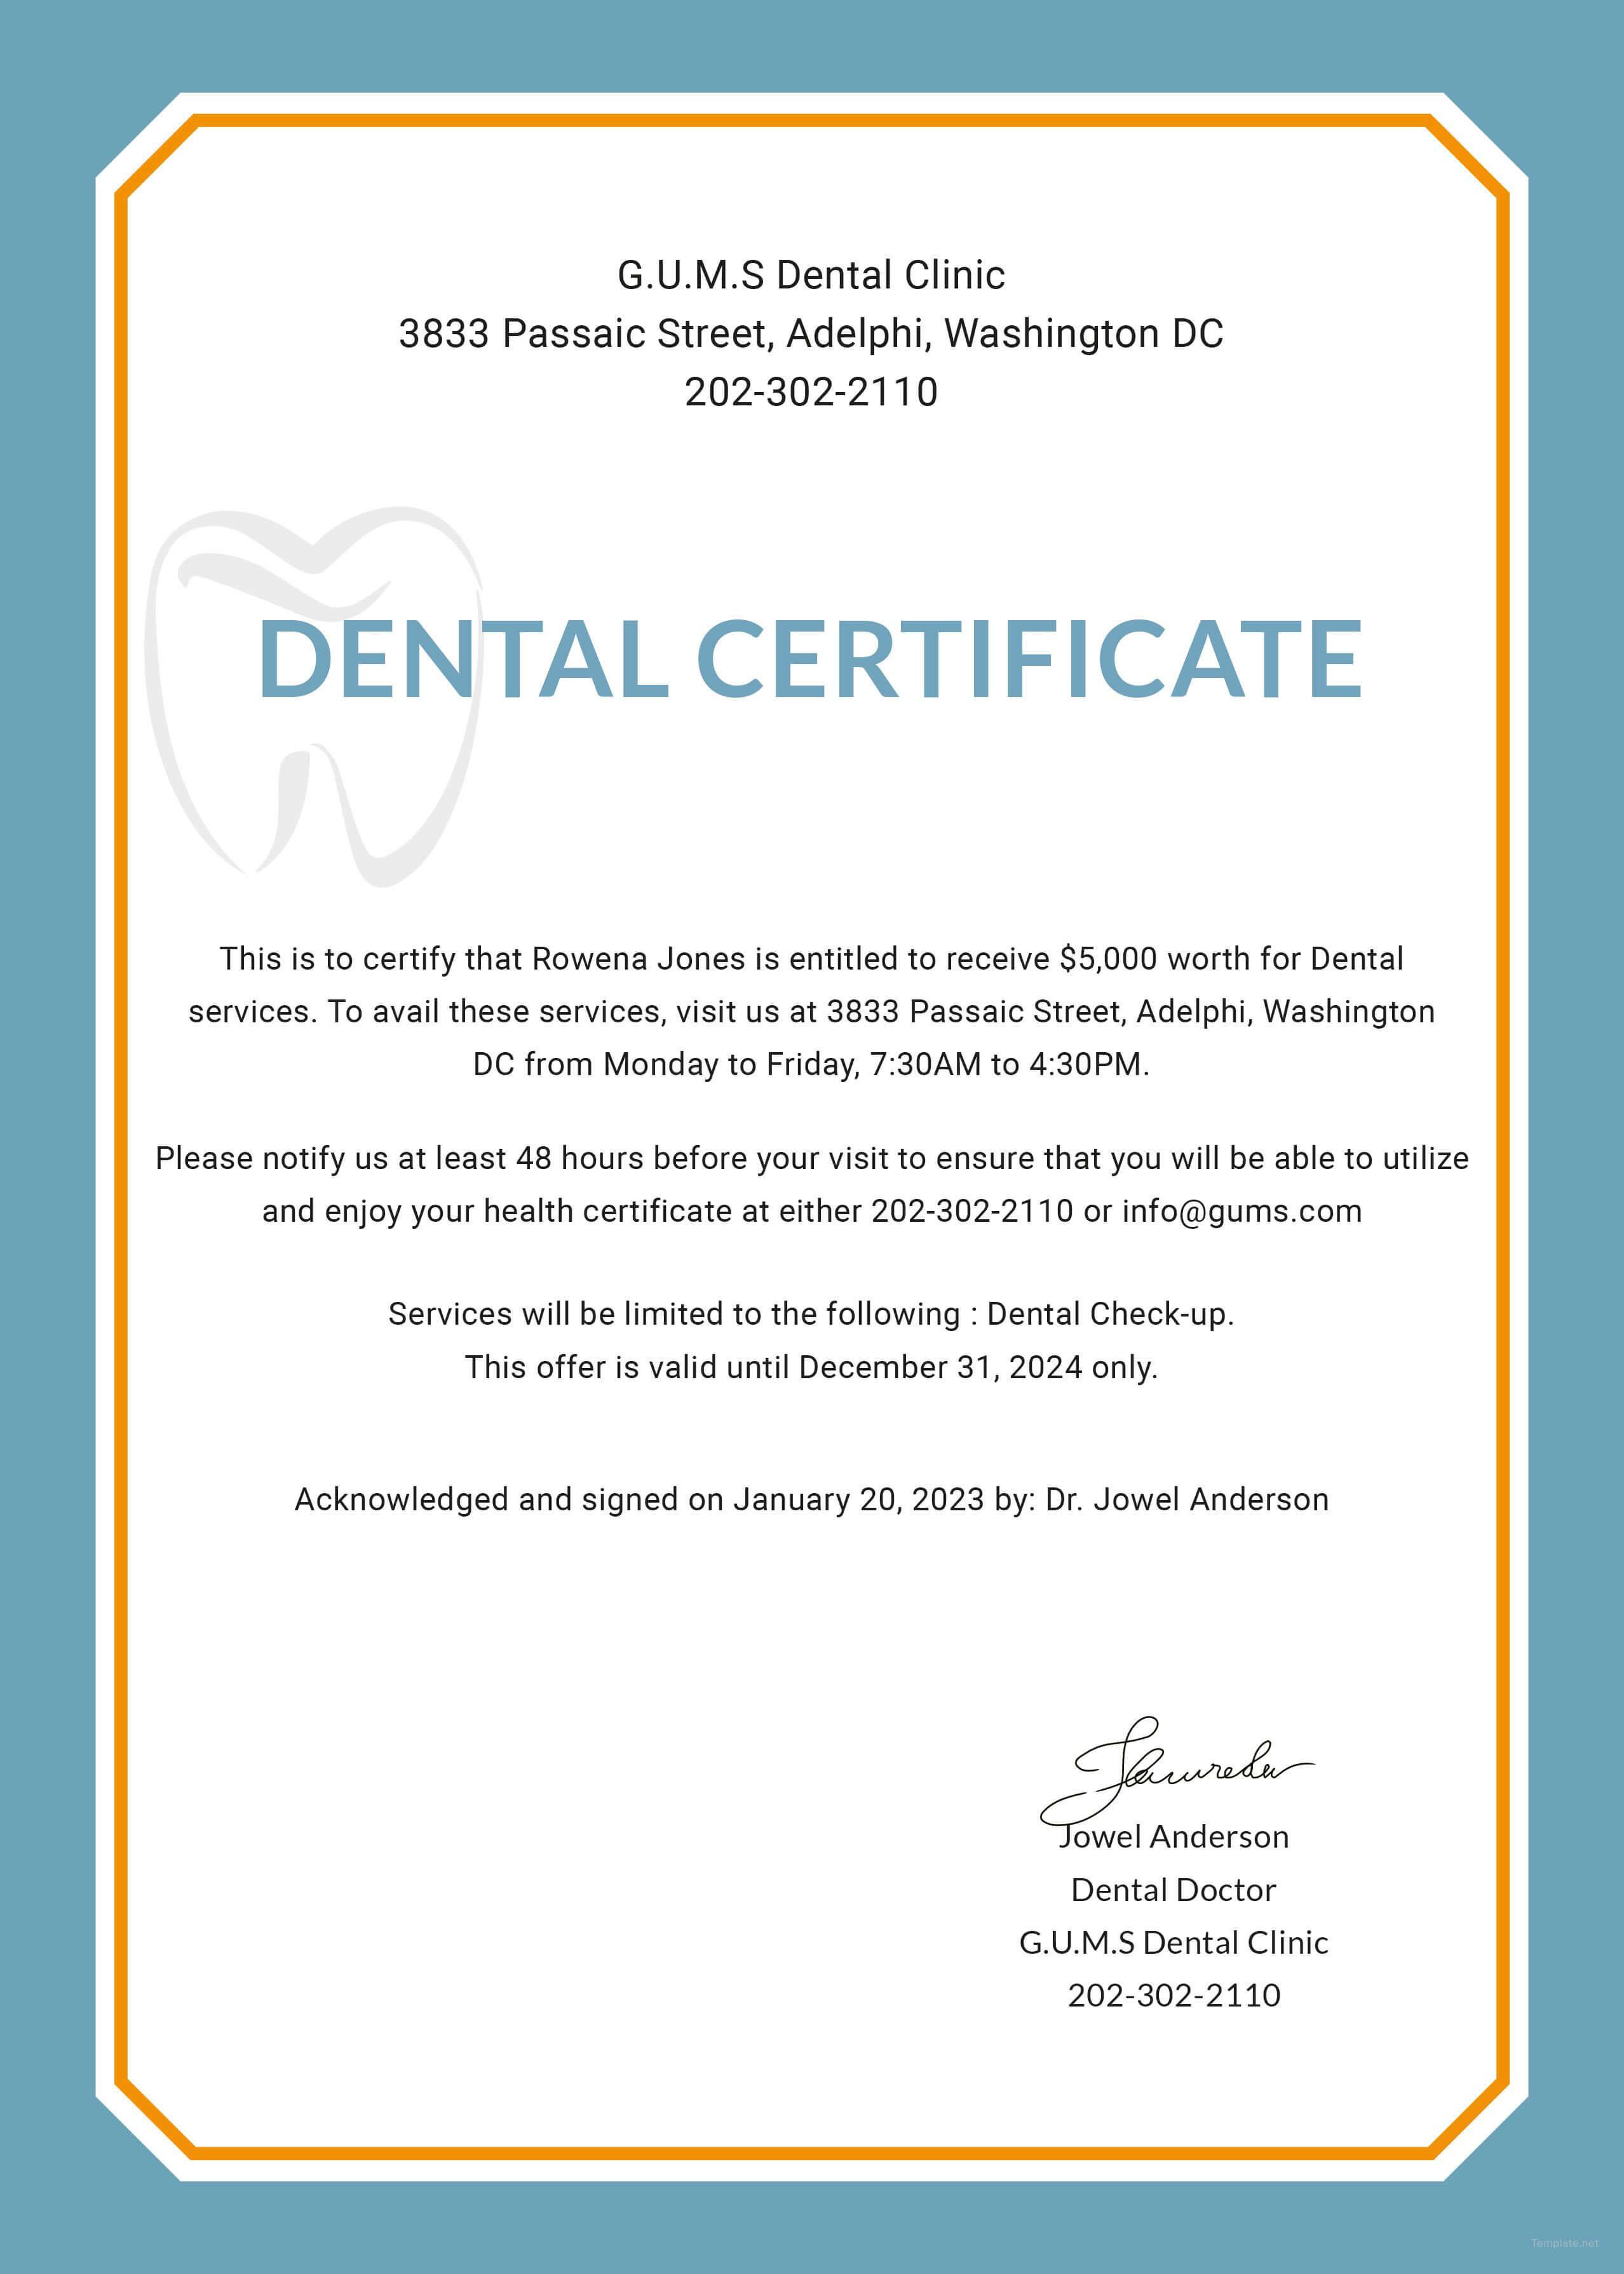 Free Dental Medical Certificate Sample | Free Dental, Dental Within Fake Medical Certificate Template Download